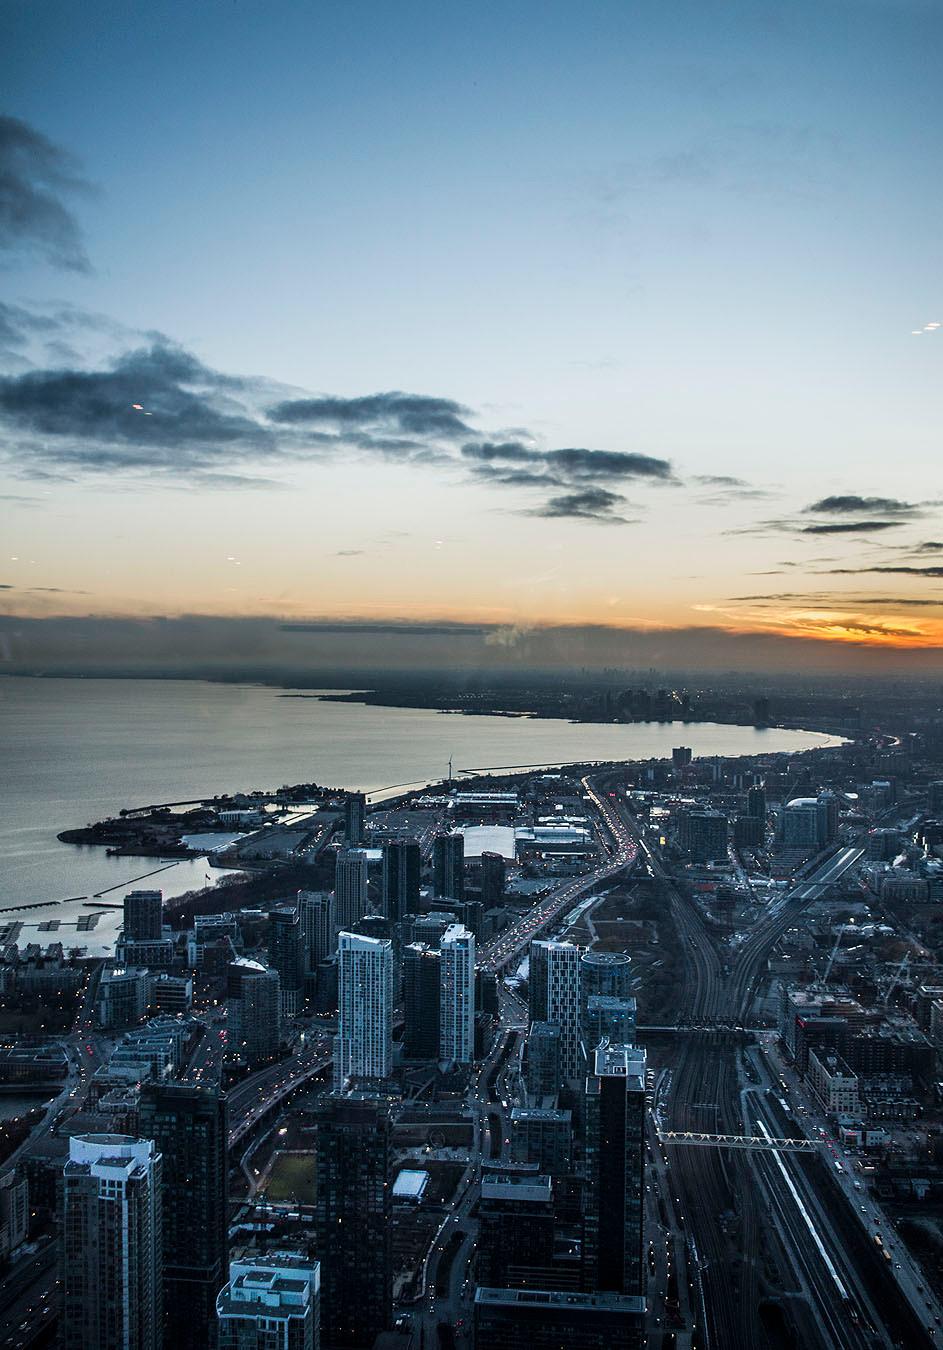 CN Tower Toronto sunset view